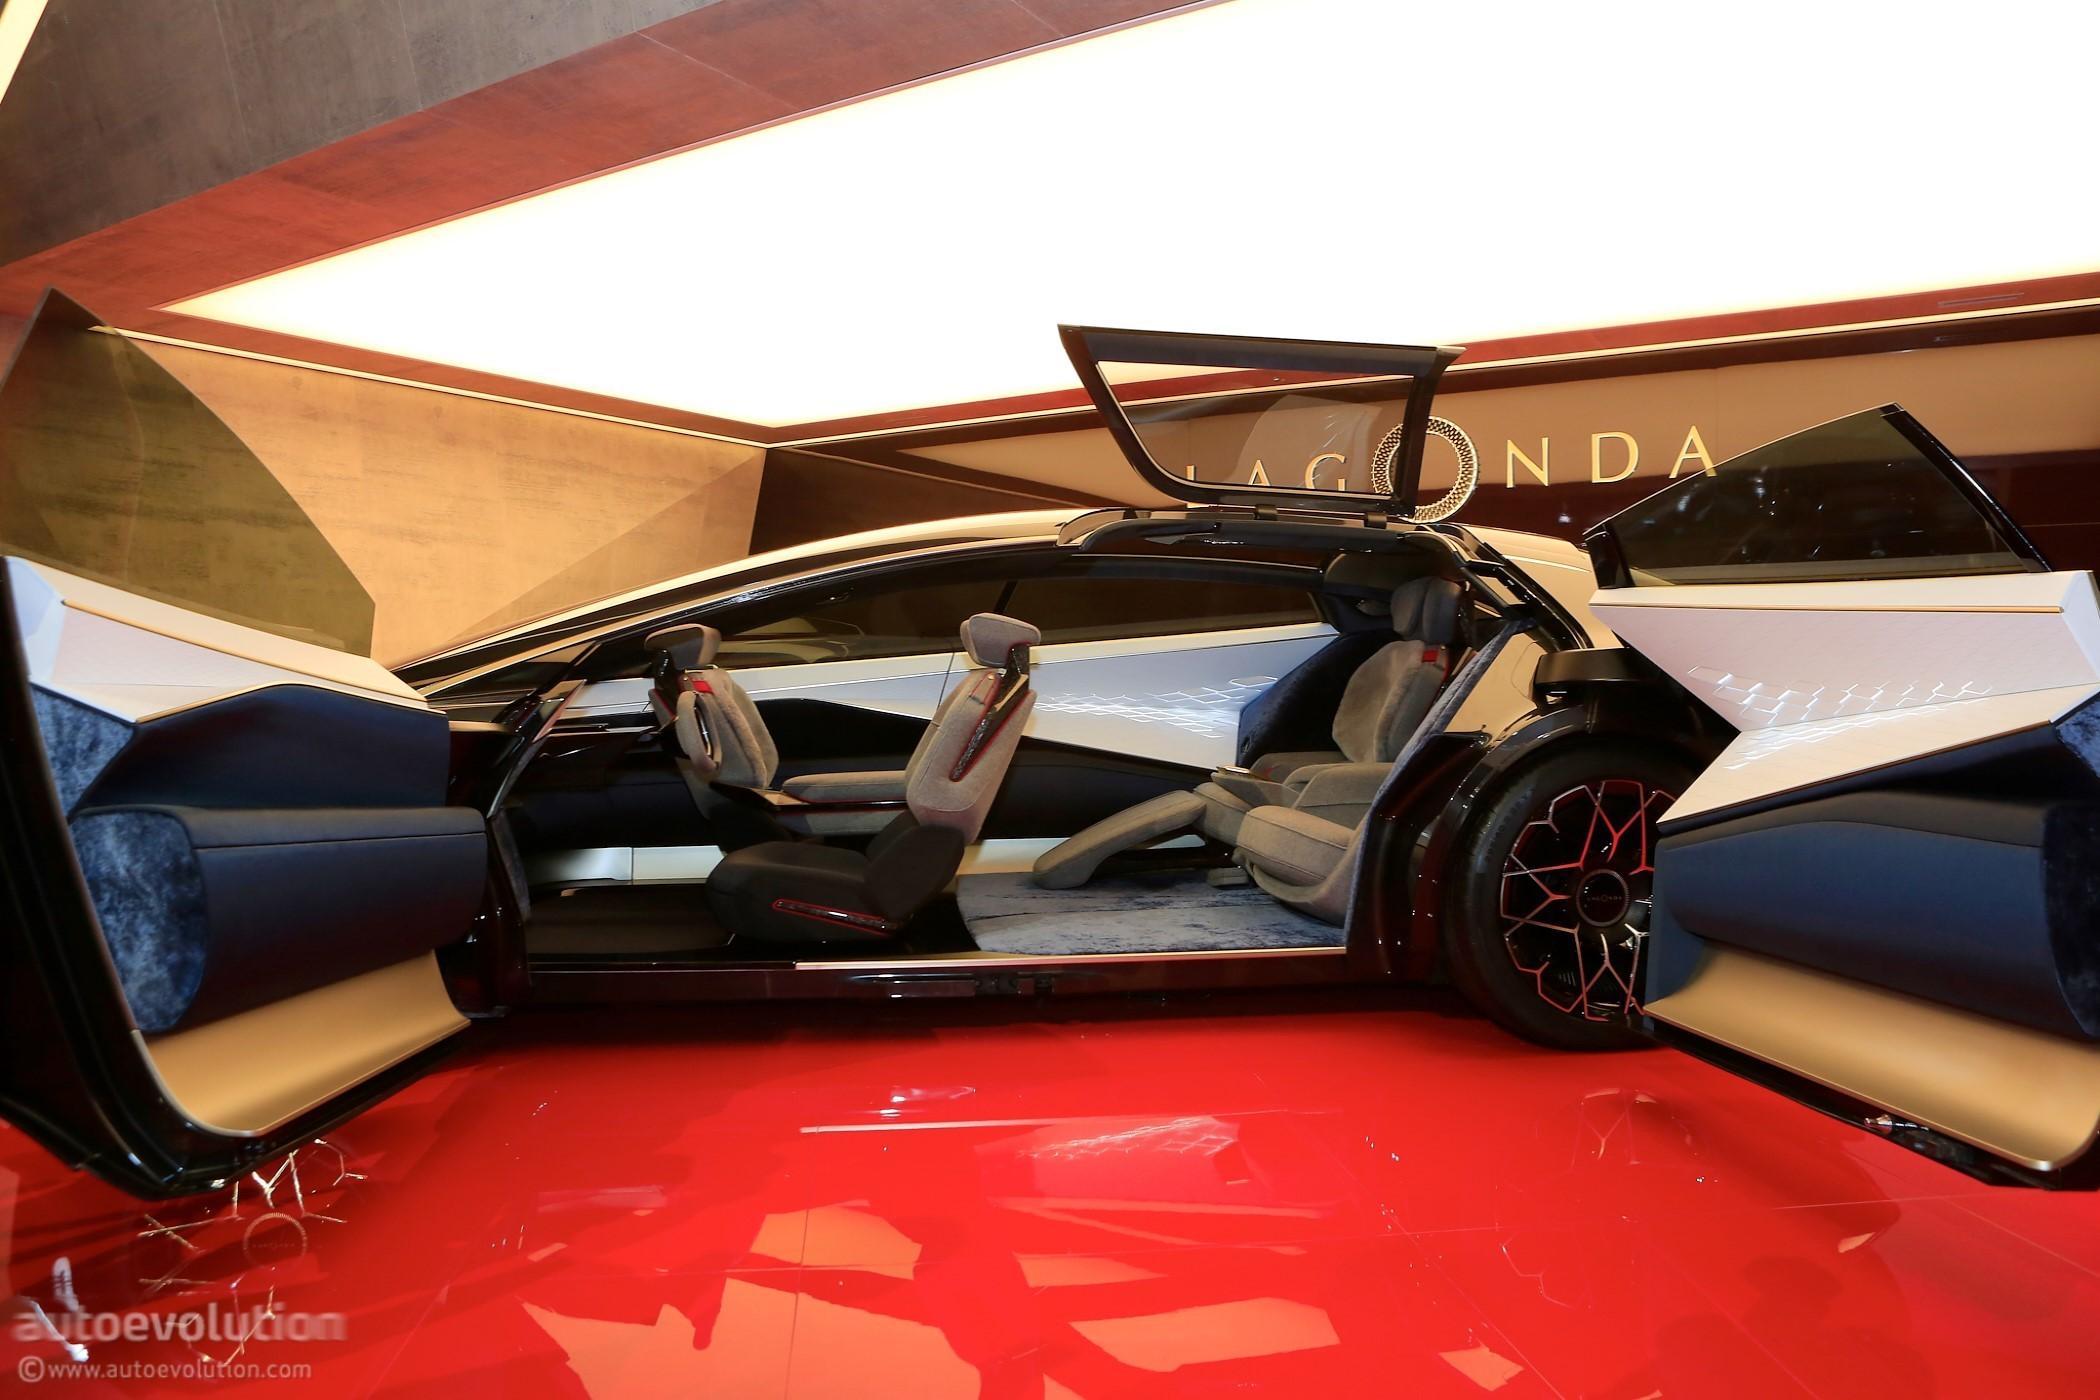 Mercedes Benz Gls >> Lagonda Vision Concept Lands In Geneva To Wash The Sins Of The Taraf - autoevolution